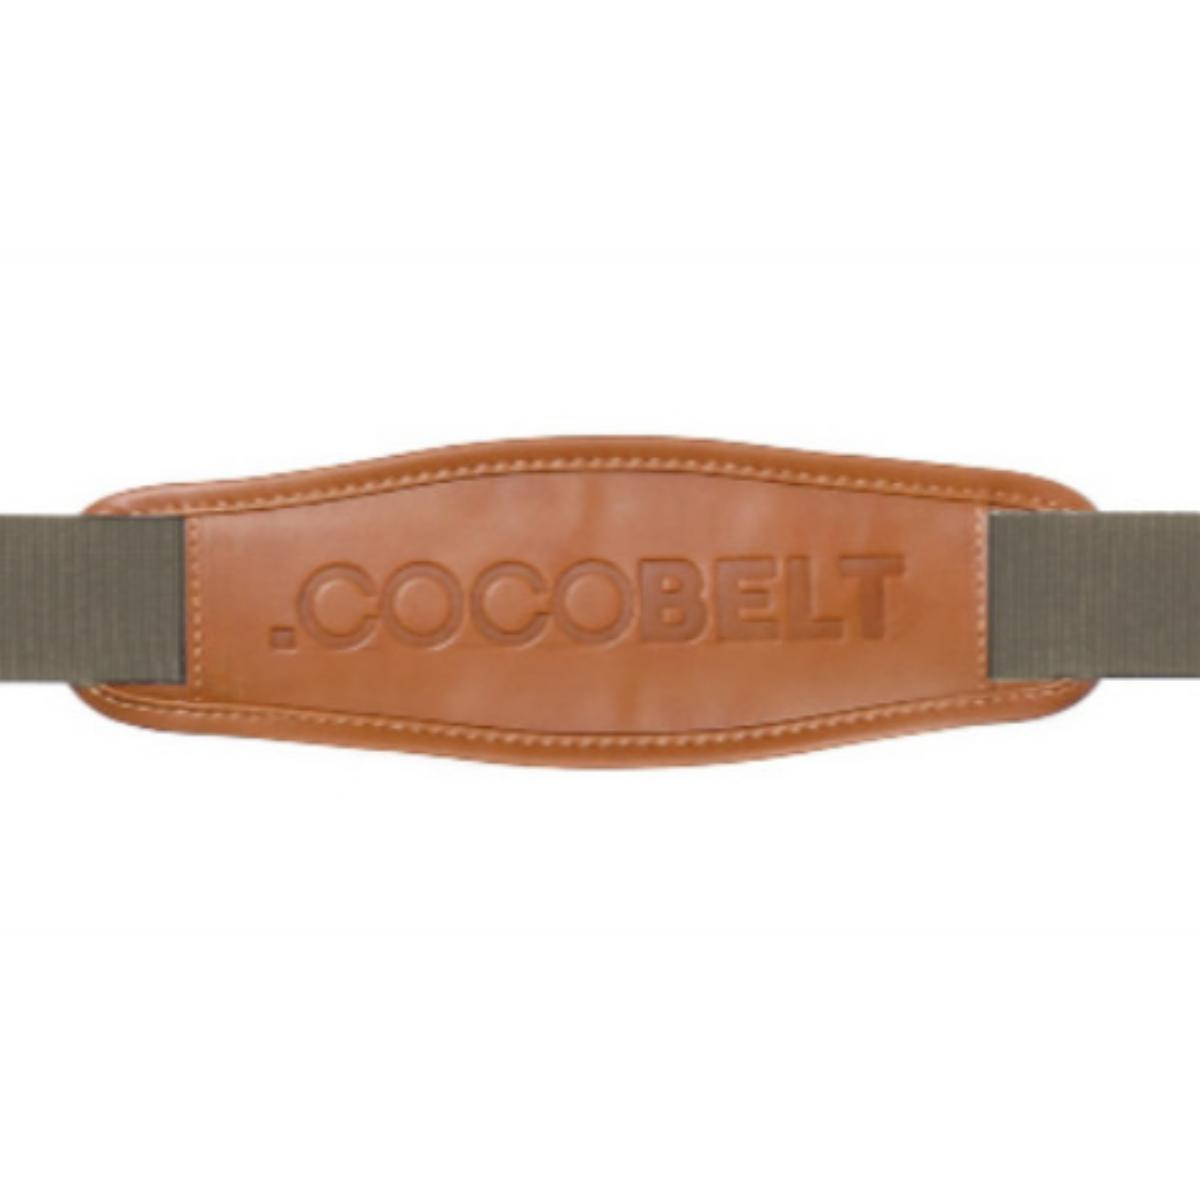 Cocobelt Cocobelt Olive/Cognac